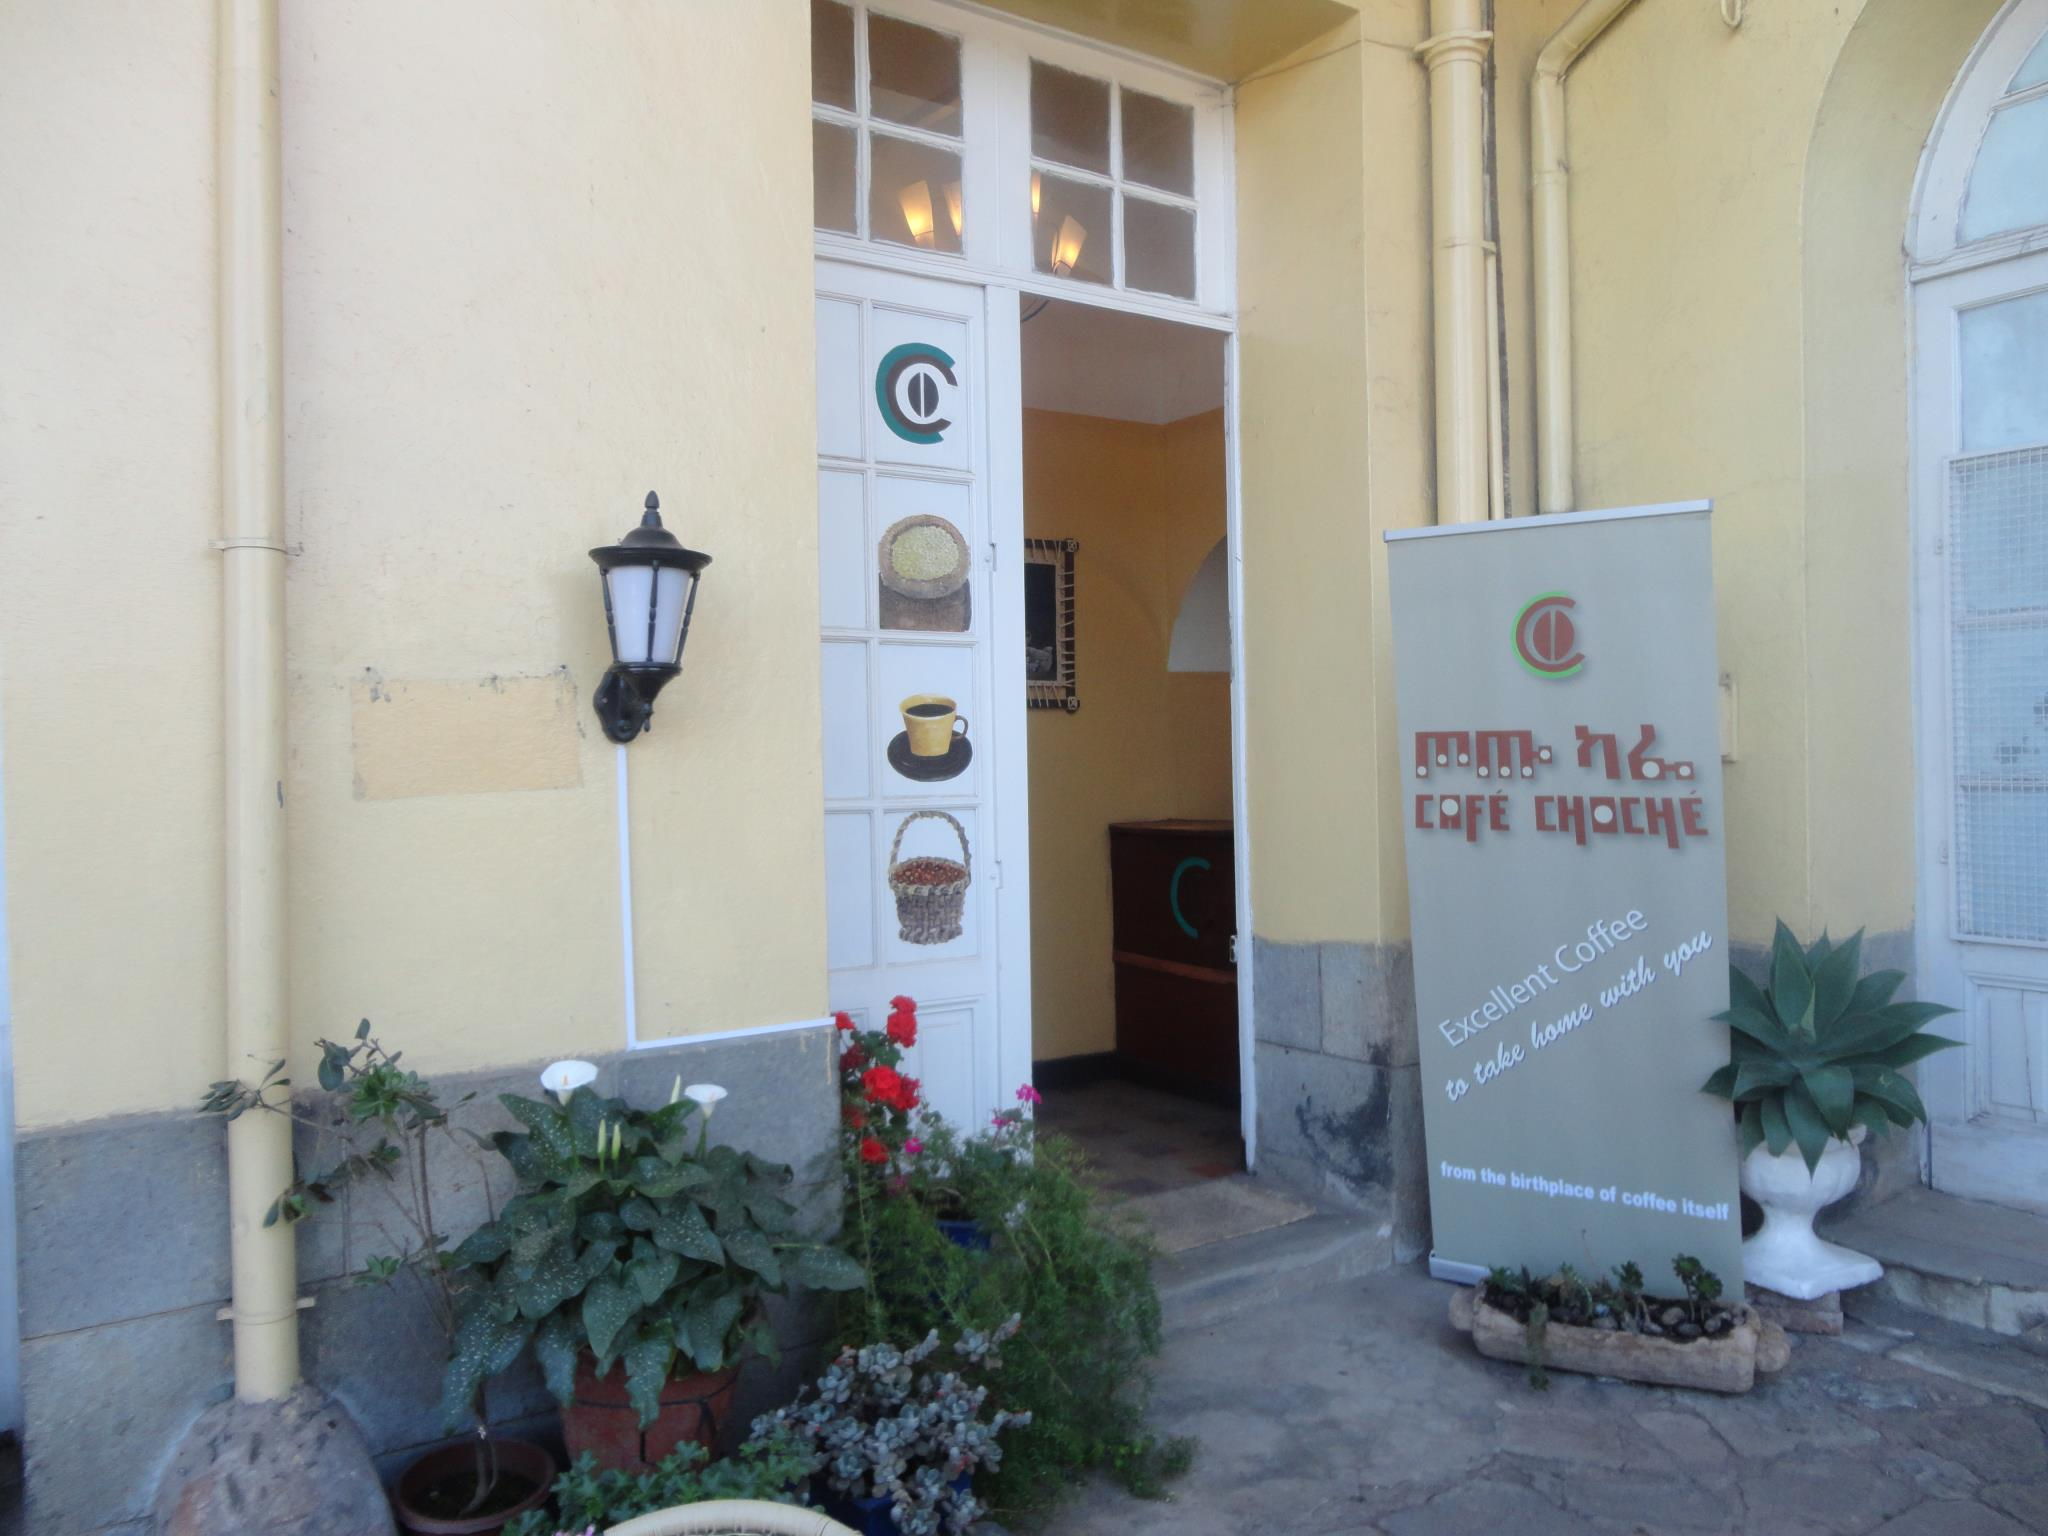 Choche Cafe, Addis Ababa